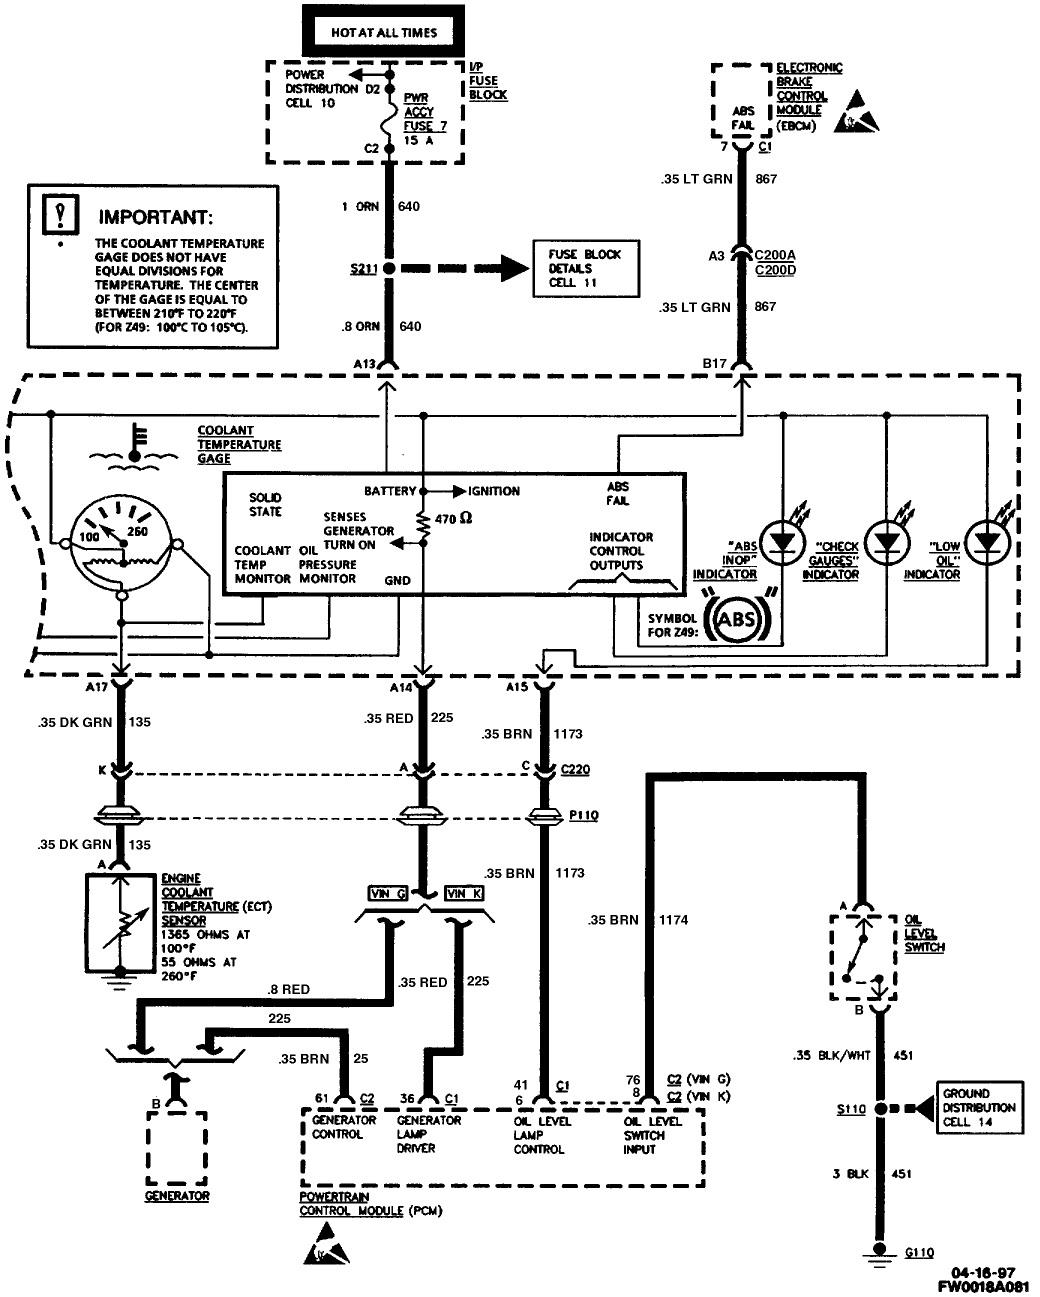 1987 Exciter Wiring Diagram - Wiring Diagrams Schema on